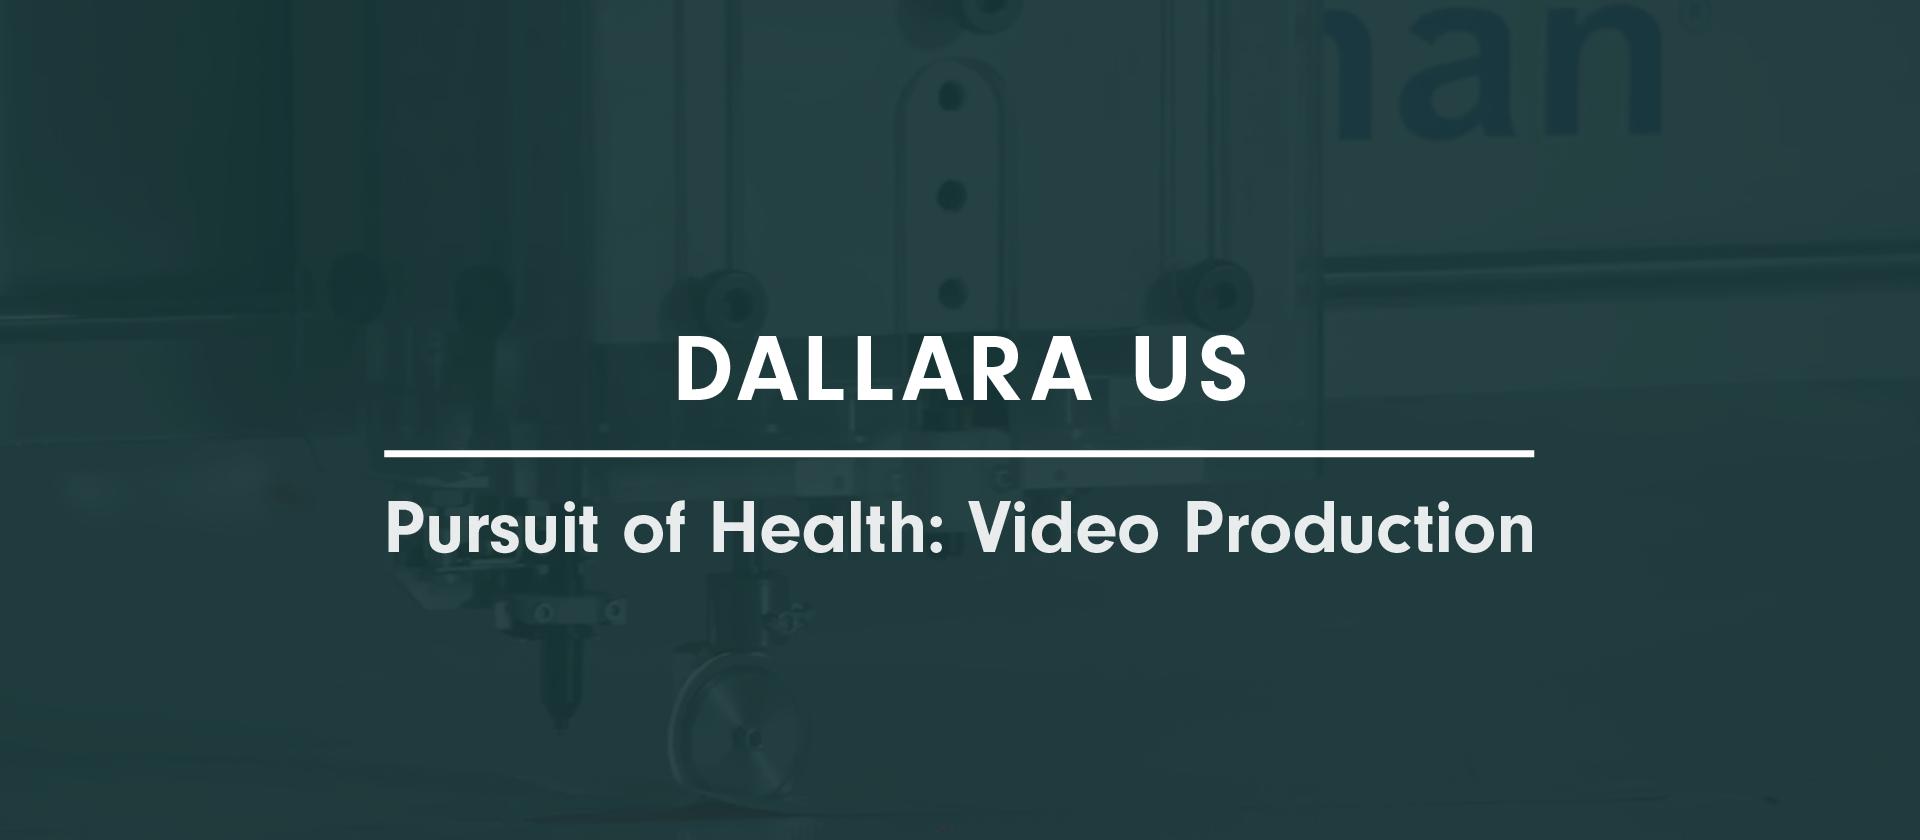 Dallara Video Production